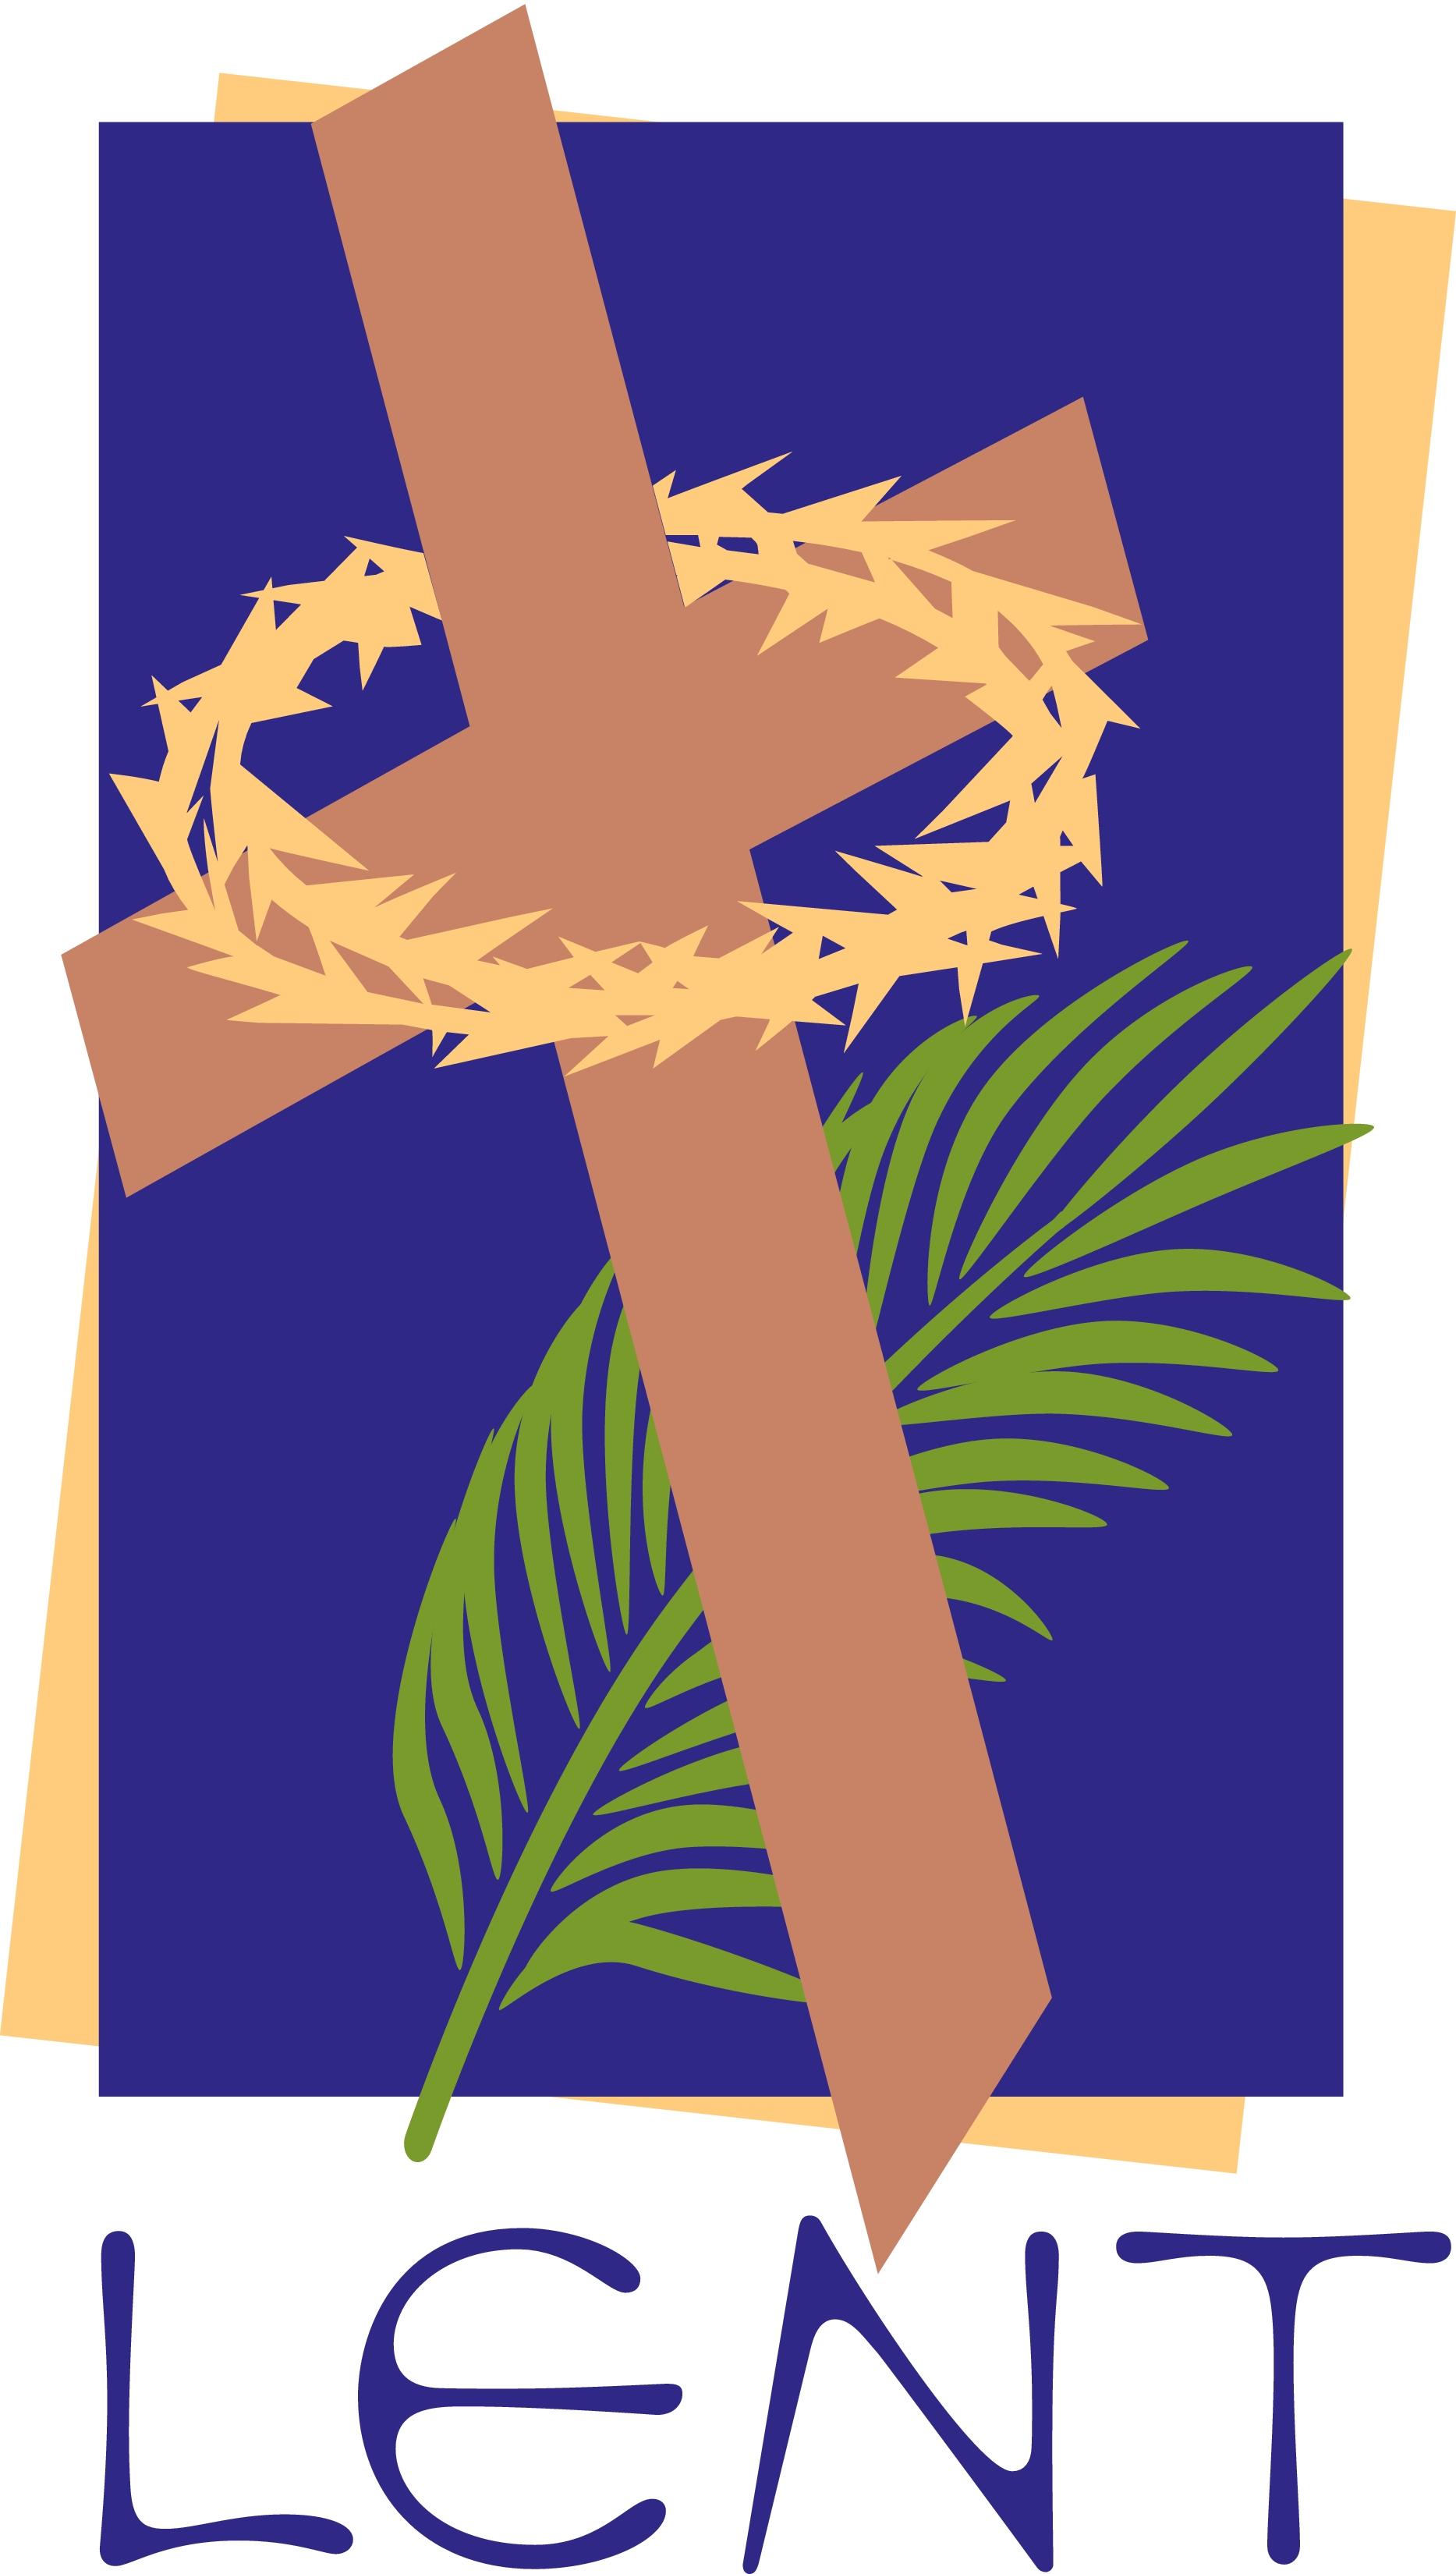 Lent clipart religious, Lent religious Transparent FREE for.